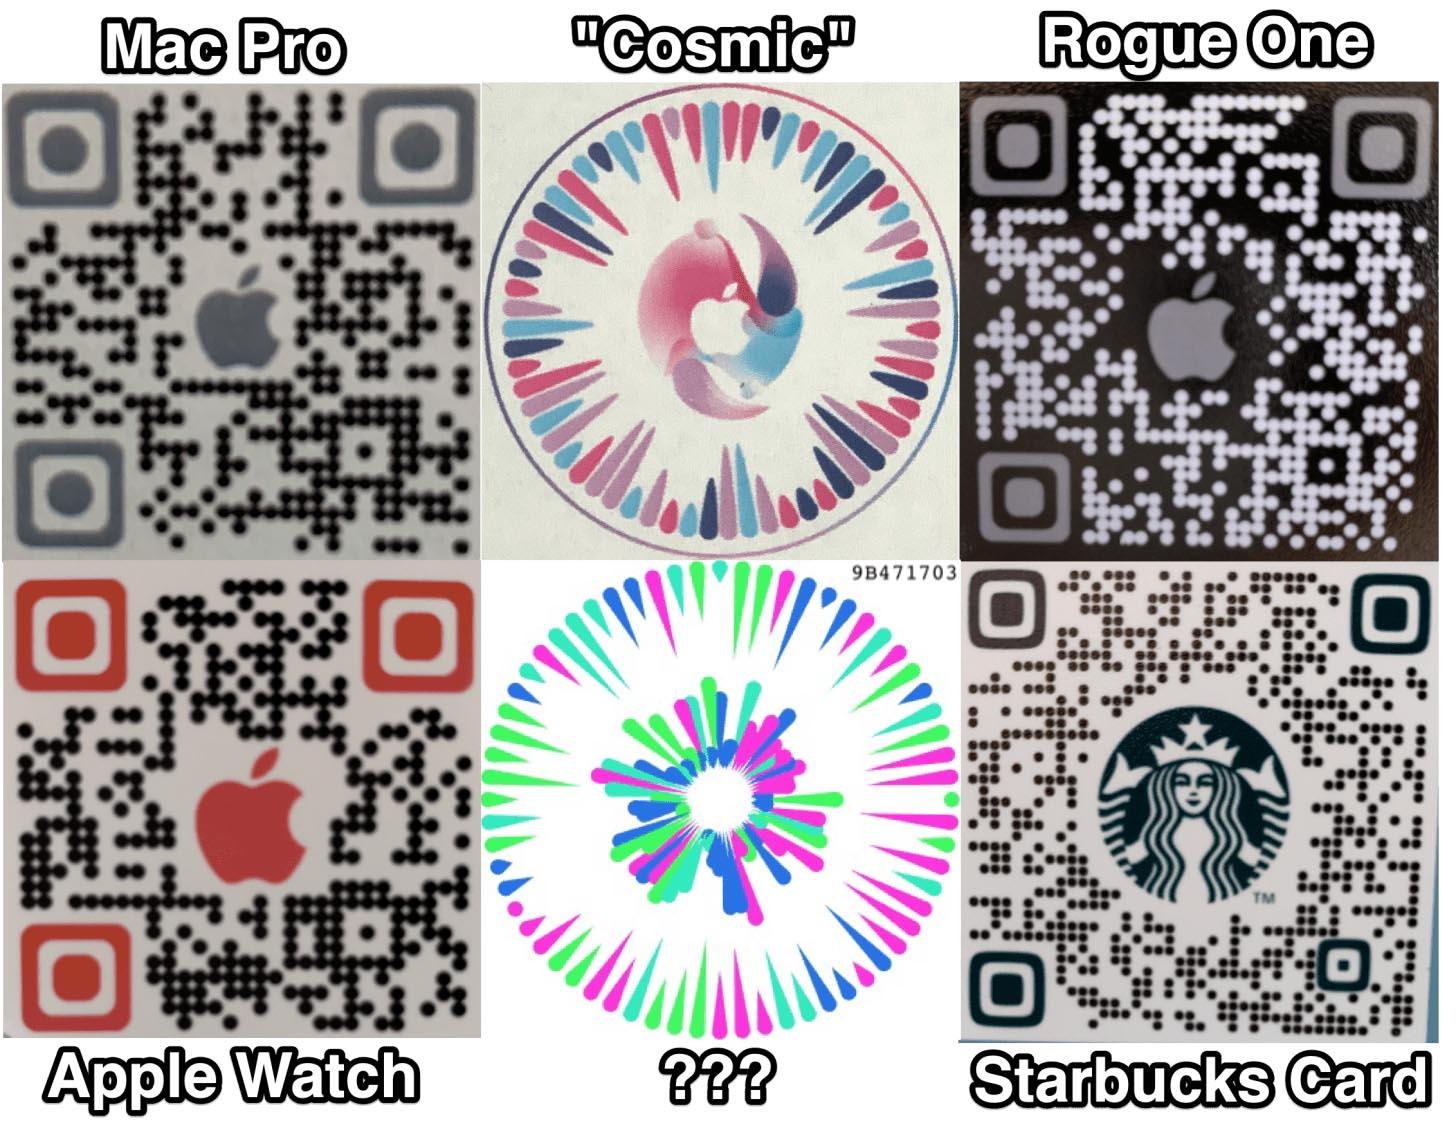 iOS 14 Gobi app QR code